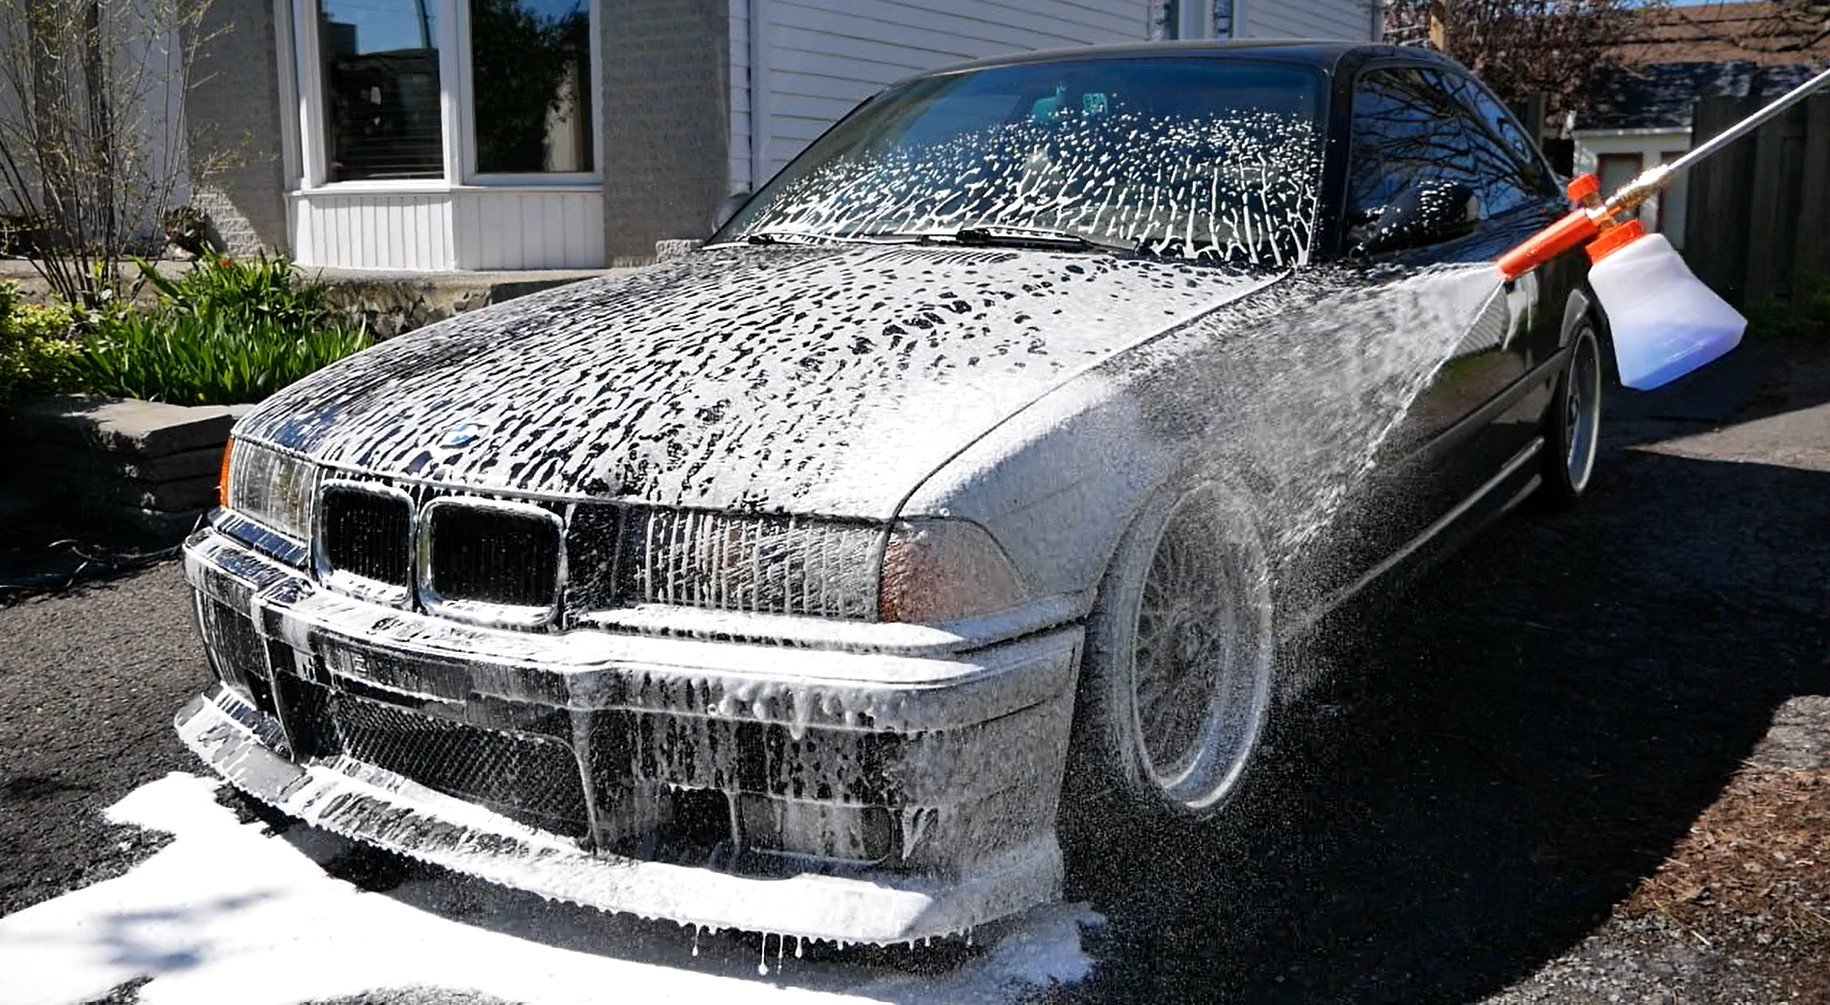 A black car being sprayed with snow foam using a foam cannon